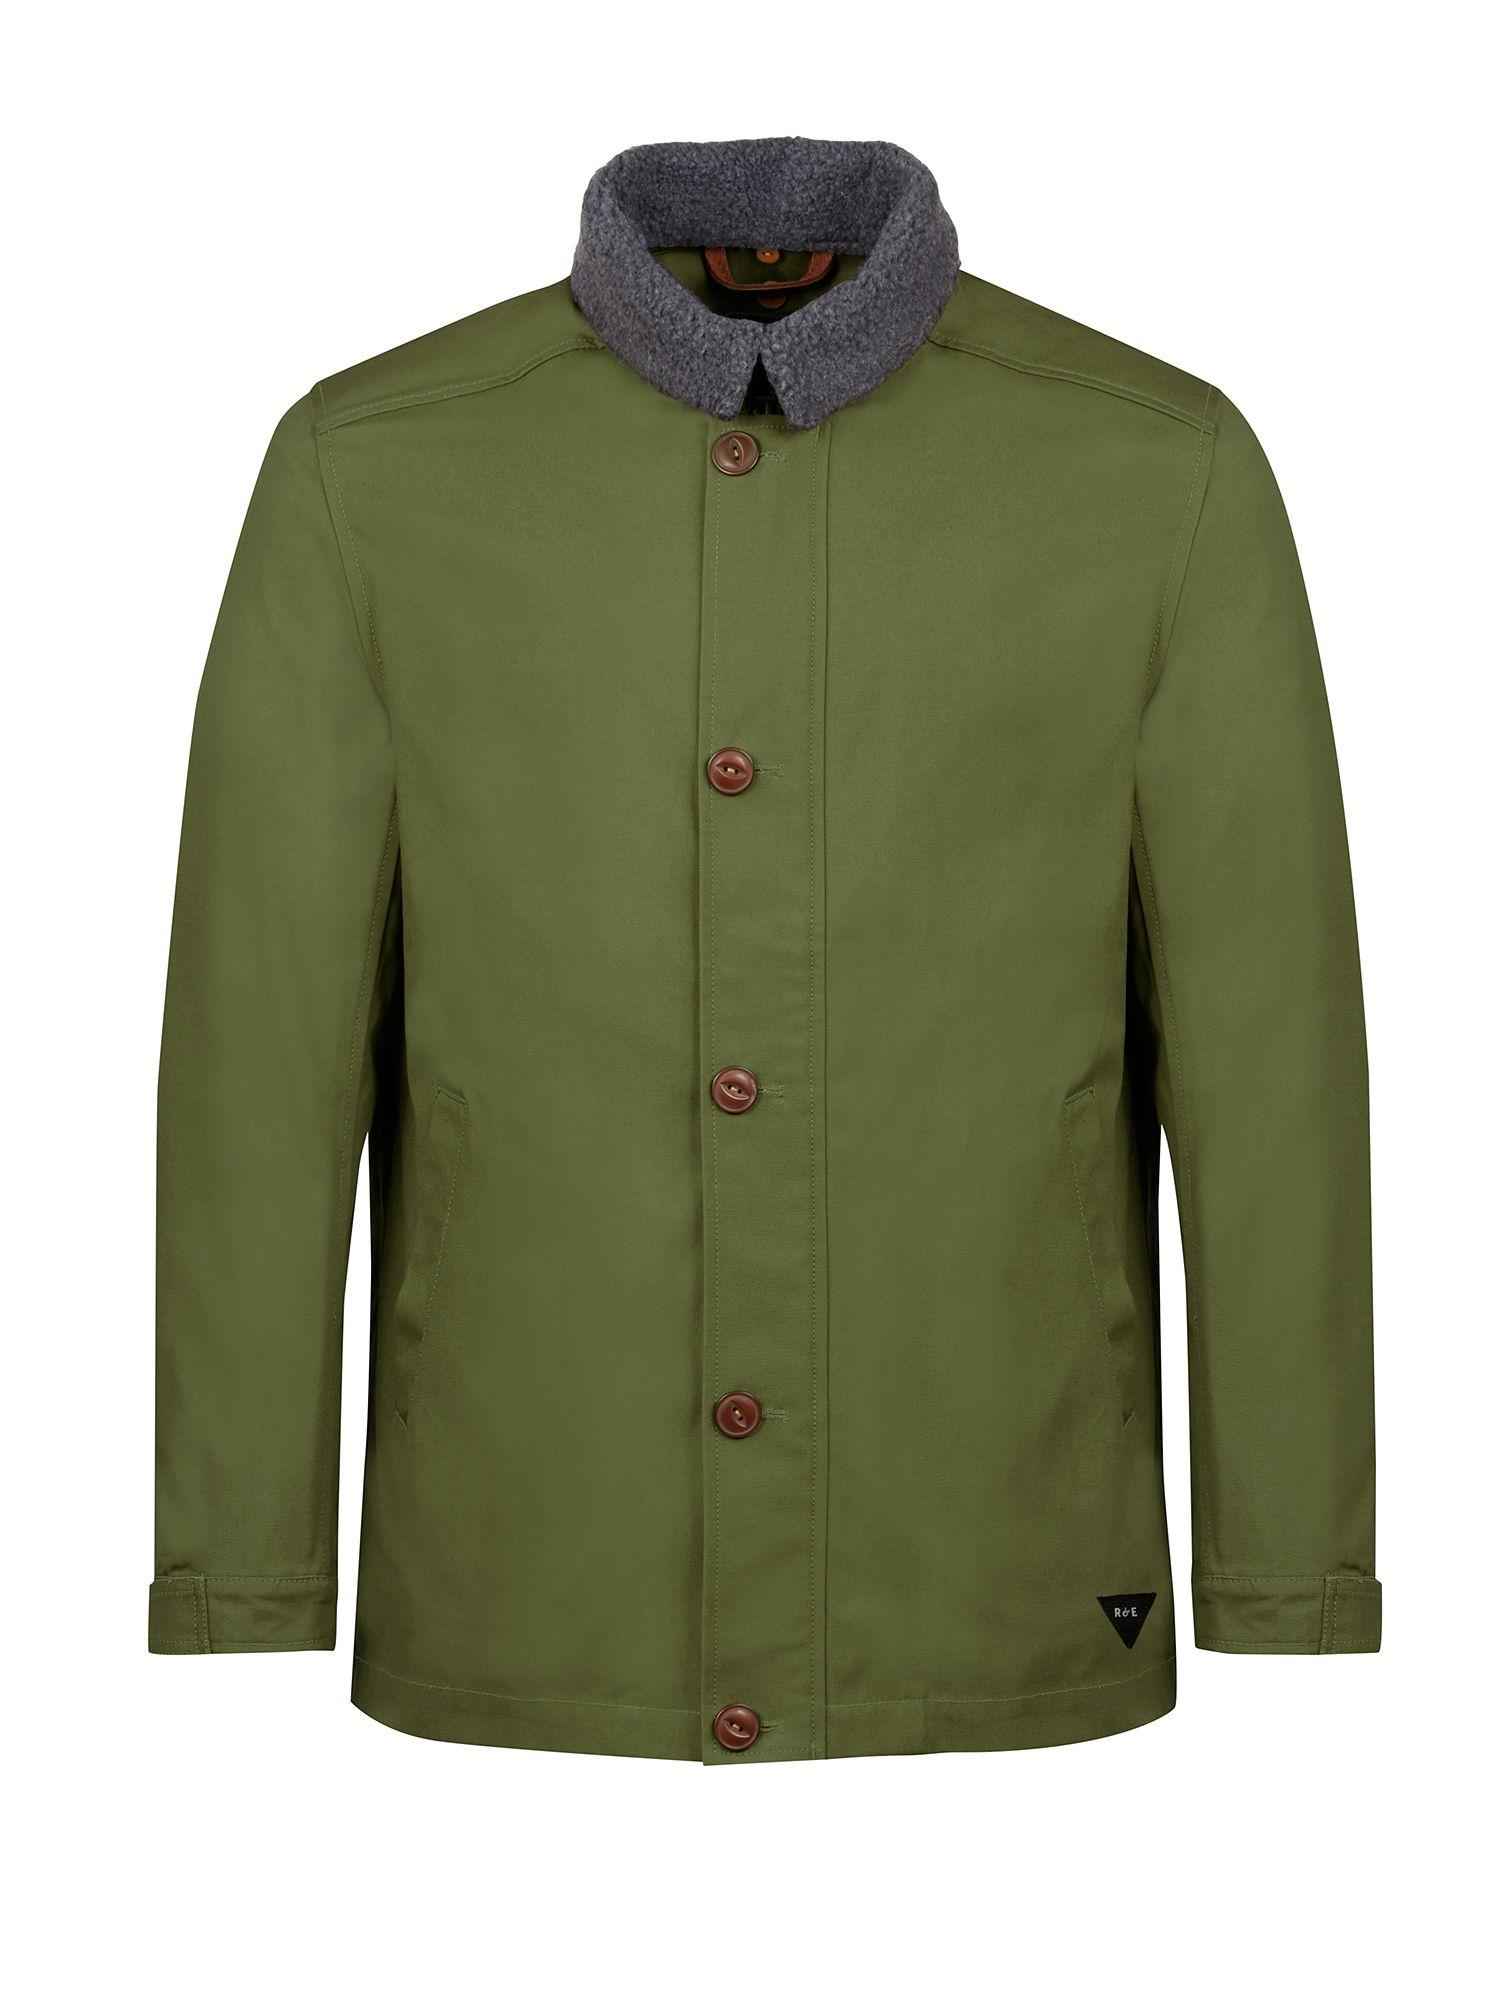 Realm & empire Car Coat With Detachable Fleece Collar in Green for